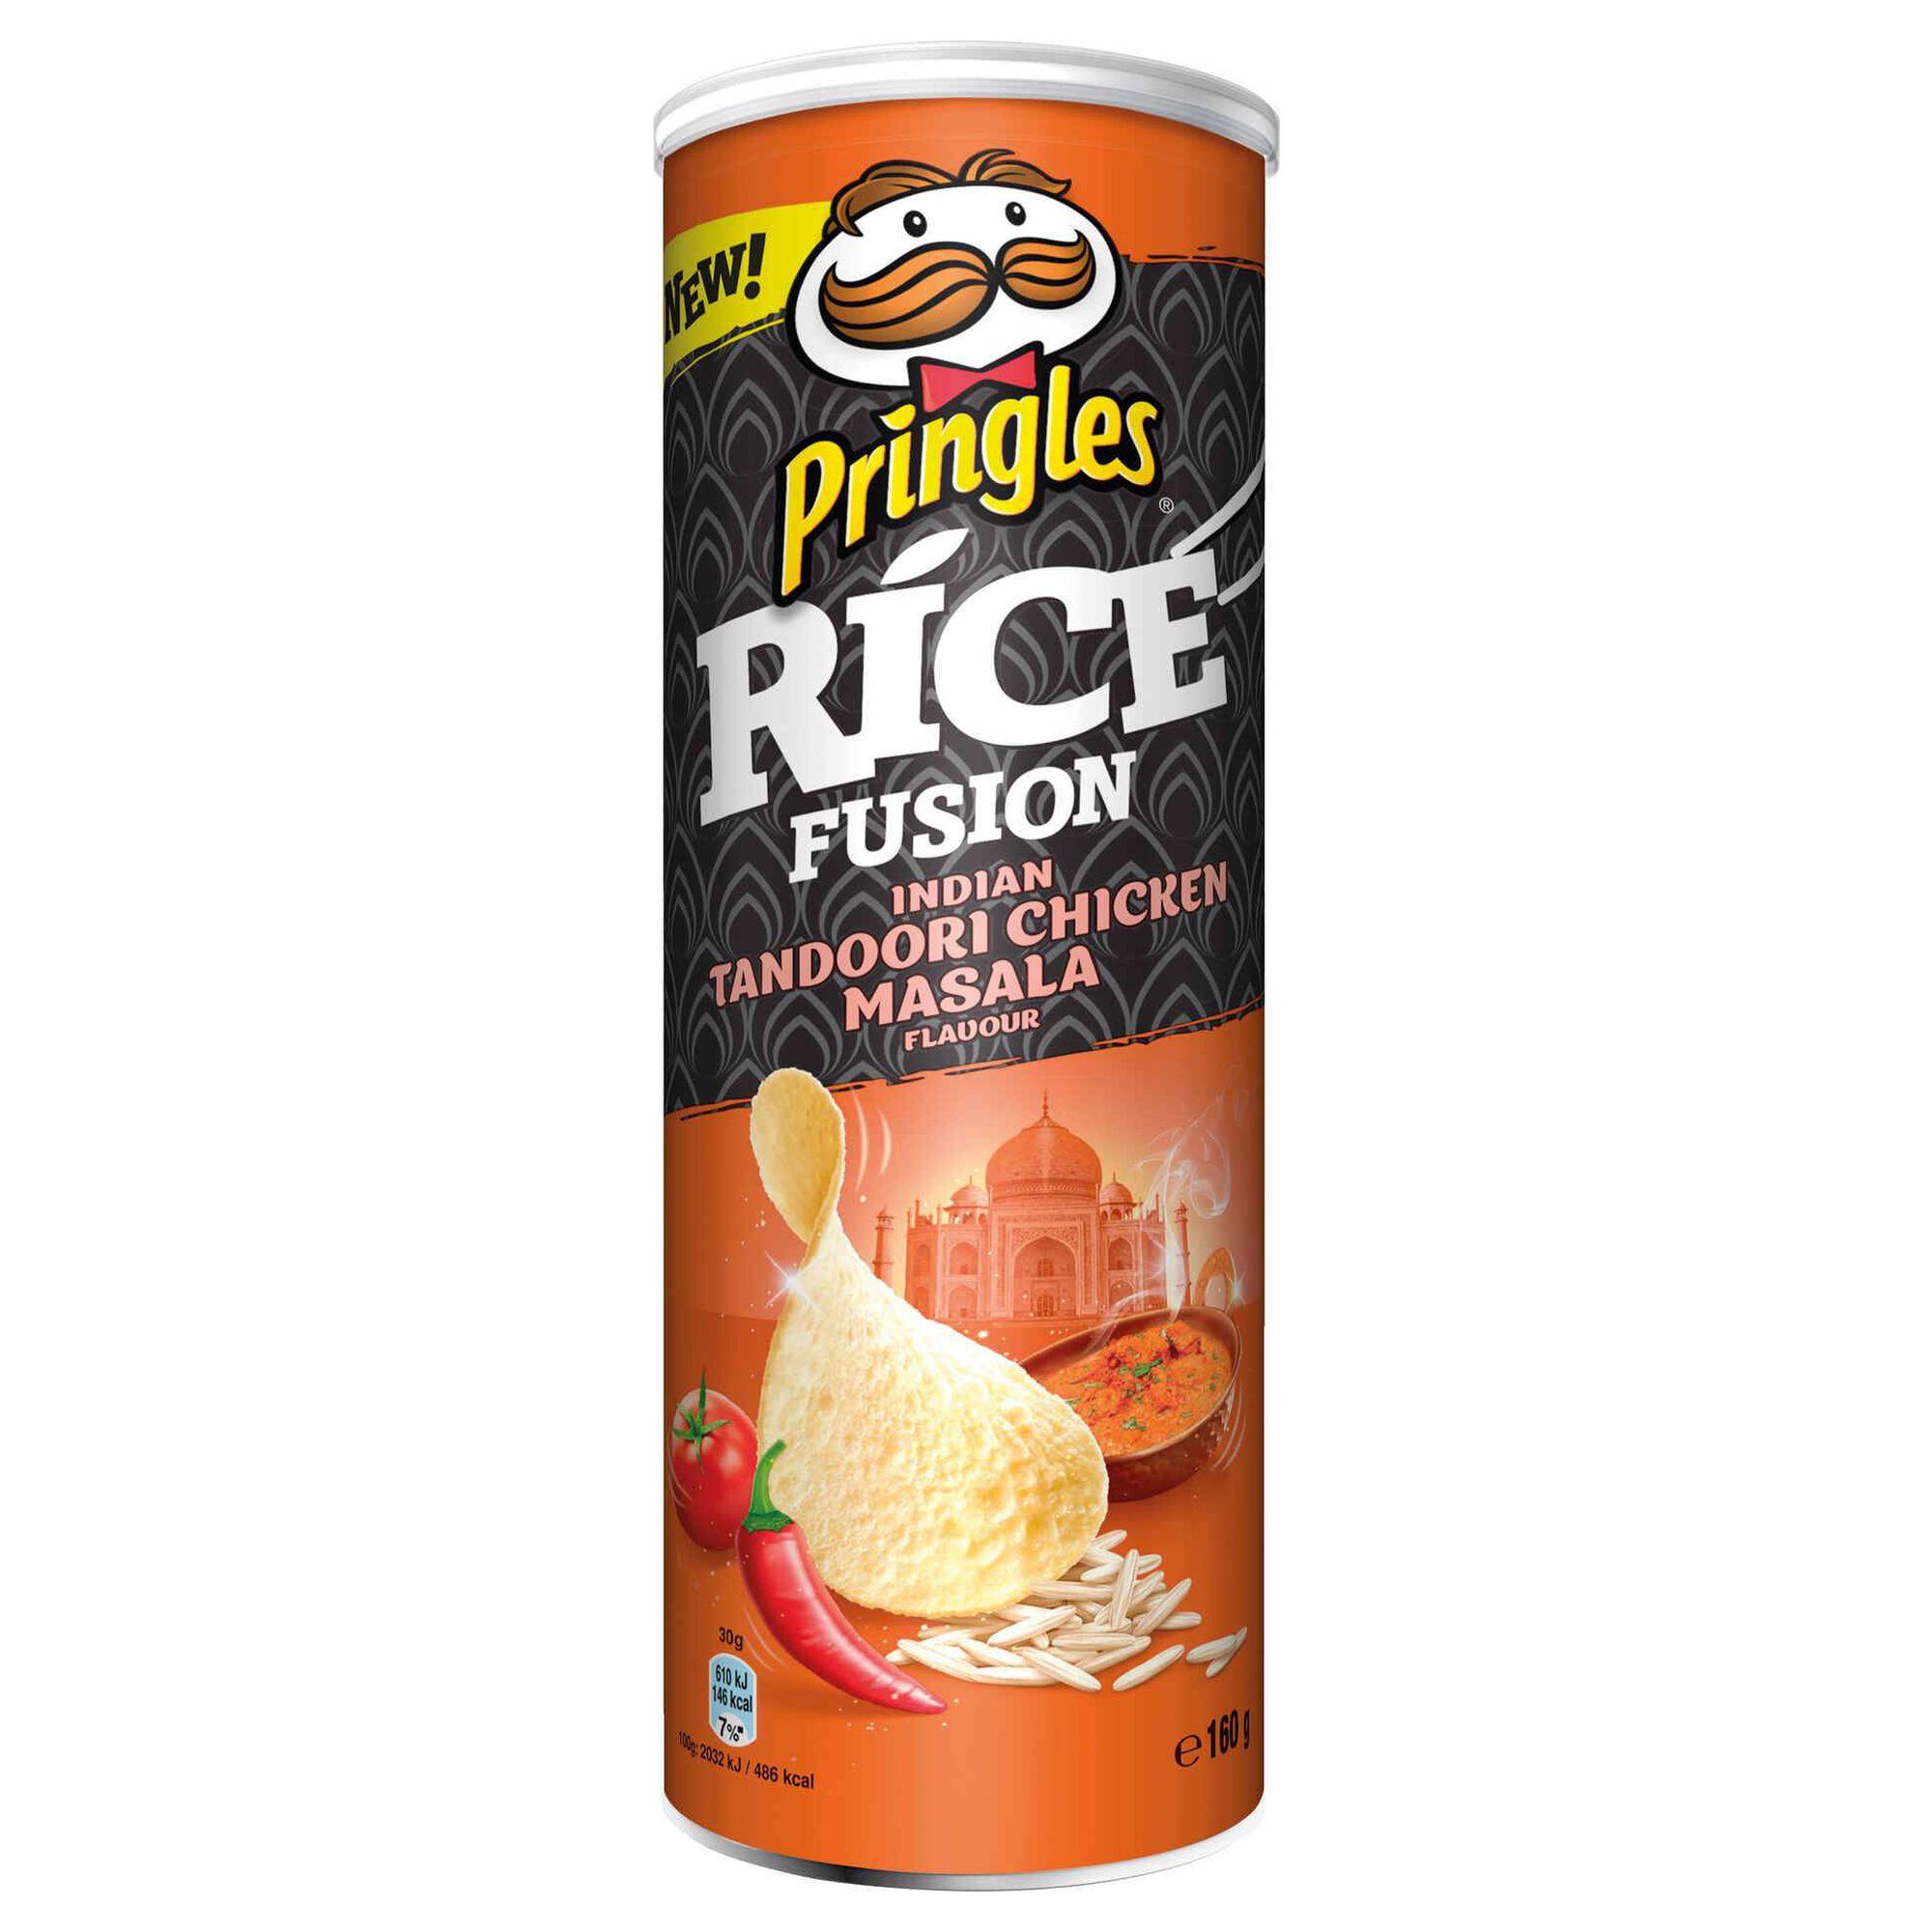 Snack Batata Rice Fusion Indian Tandoori sabor Chicken Masala